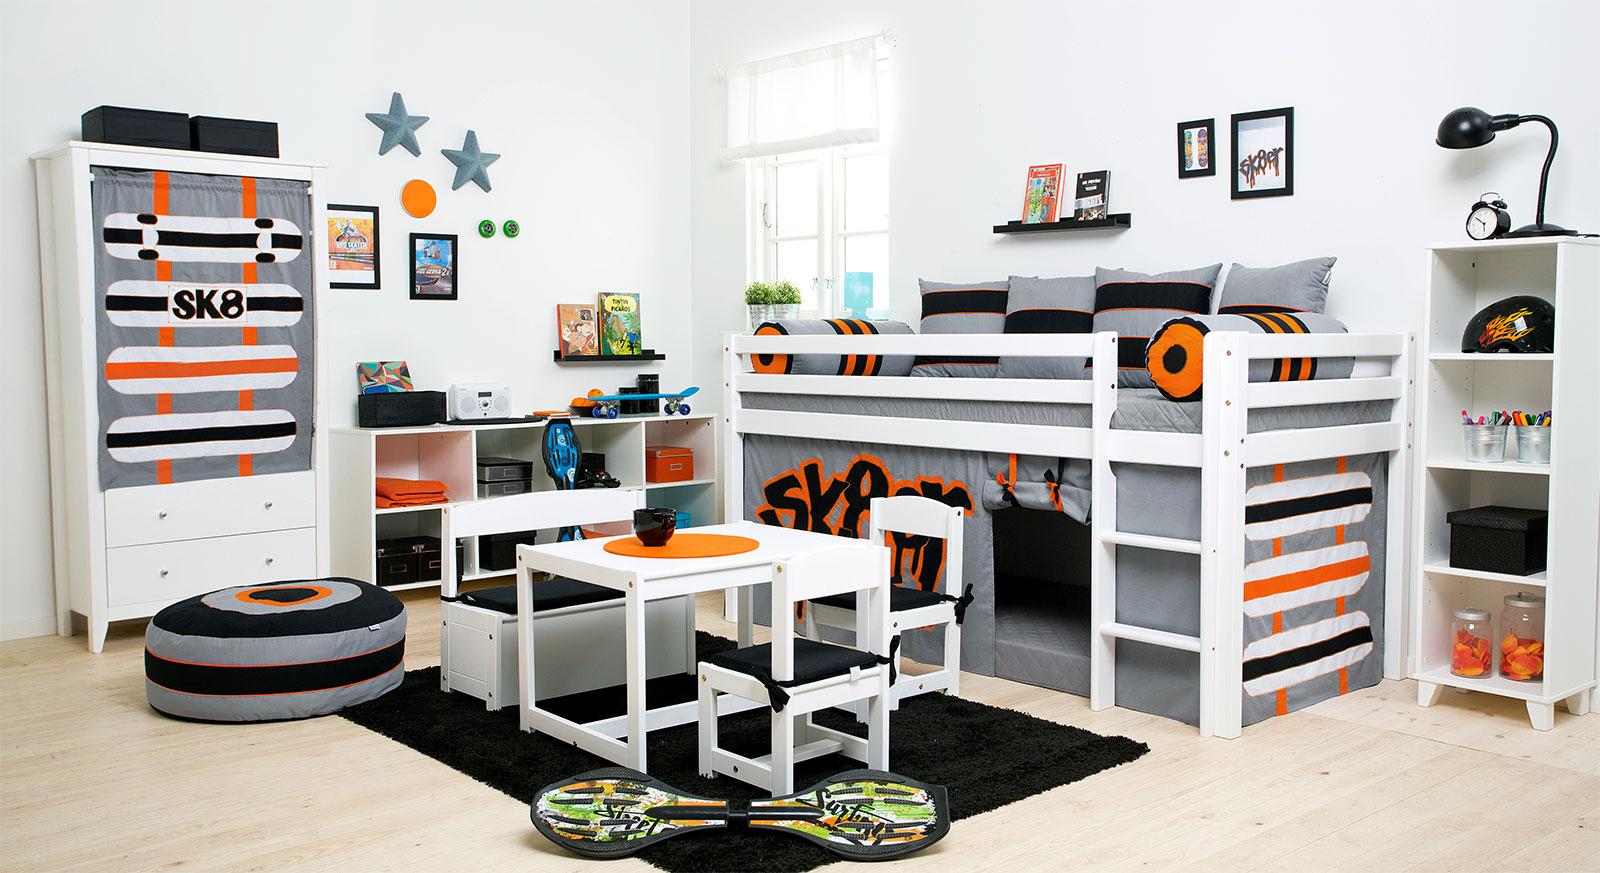 Komplett-Kinderzimmer Skater aus weiß lackierter Kiefer